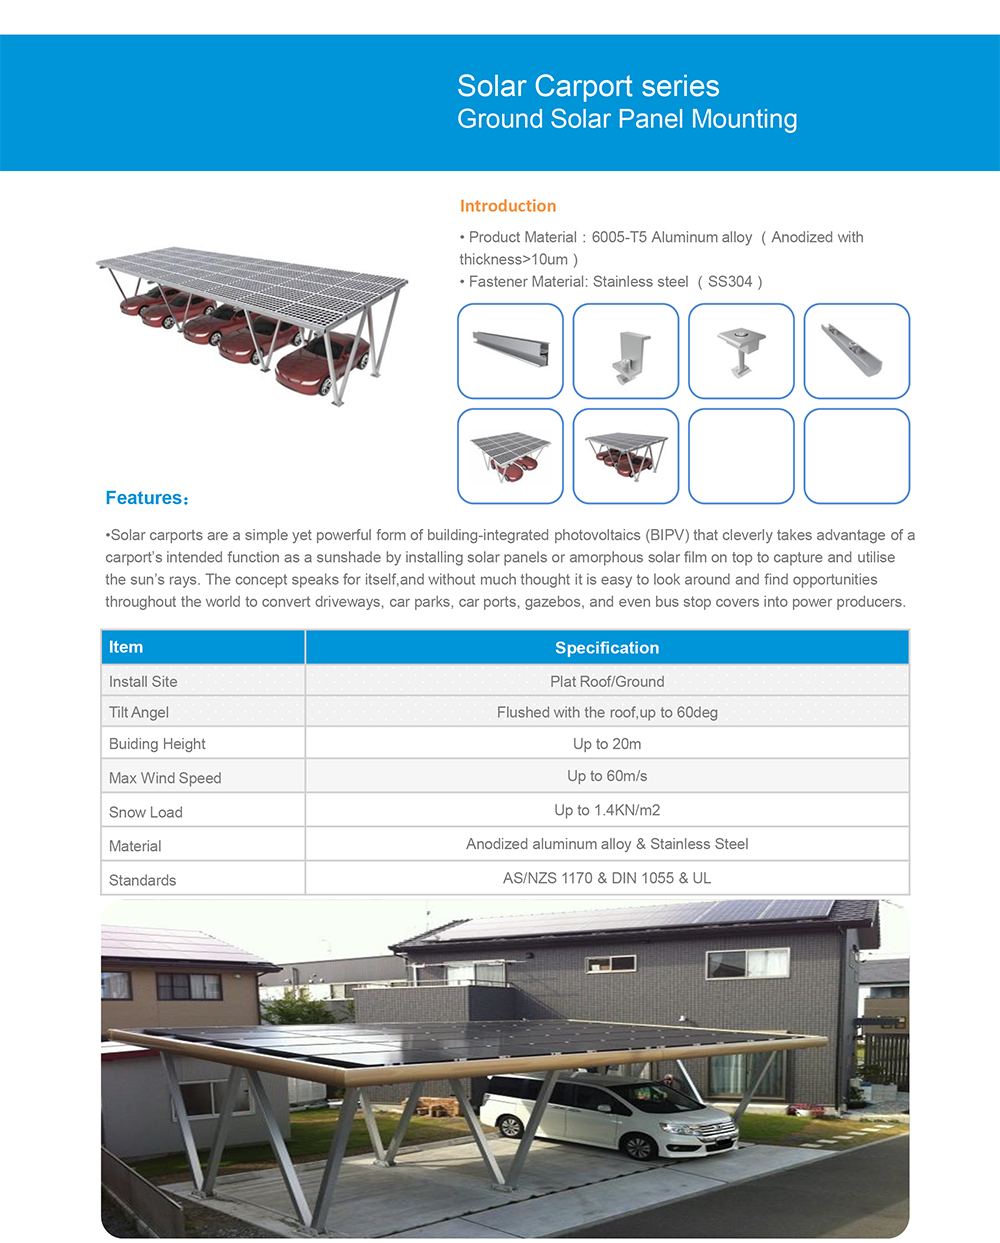 Smart Design Car Roof Bracket Install Carport Solar Panel For Power System